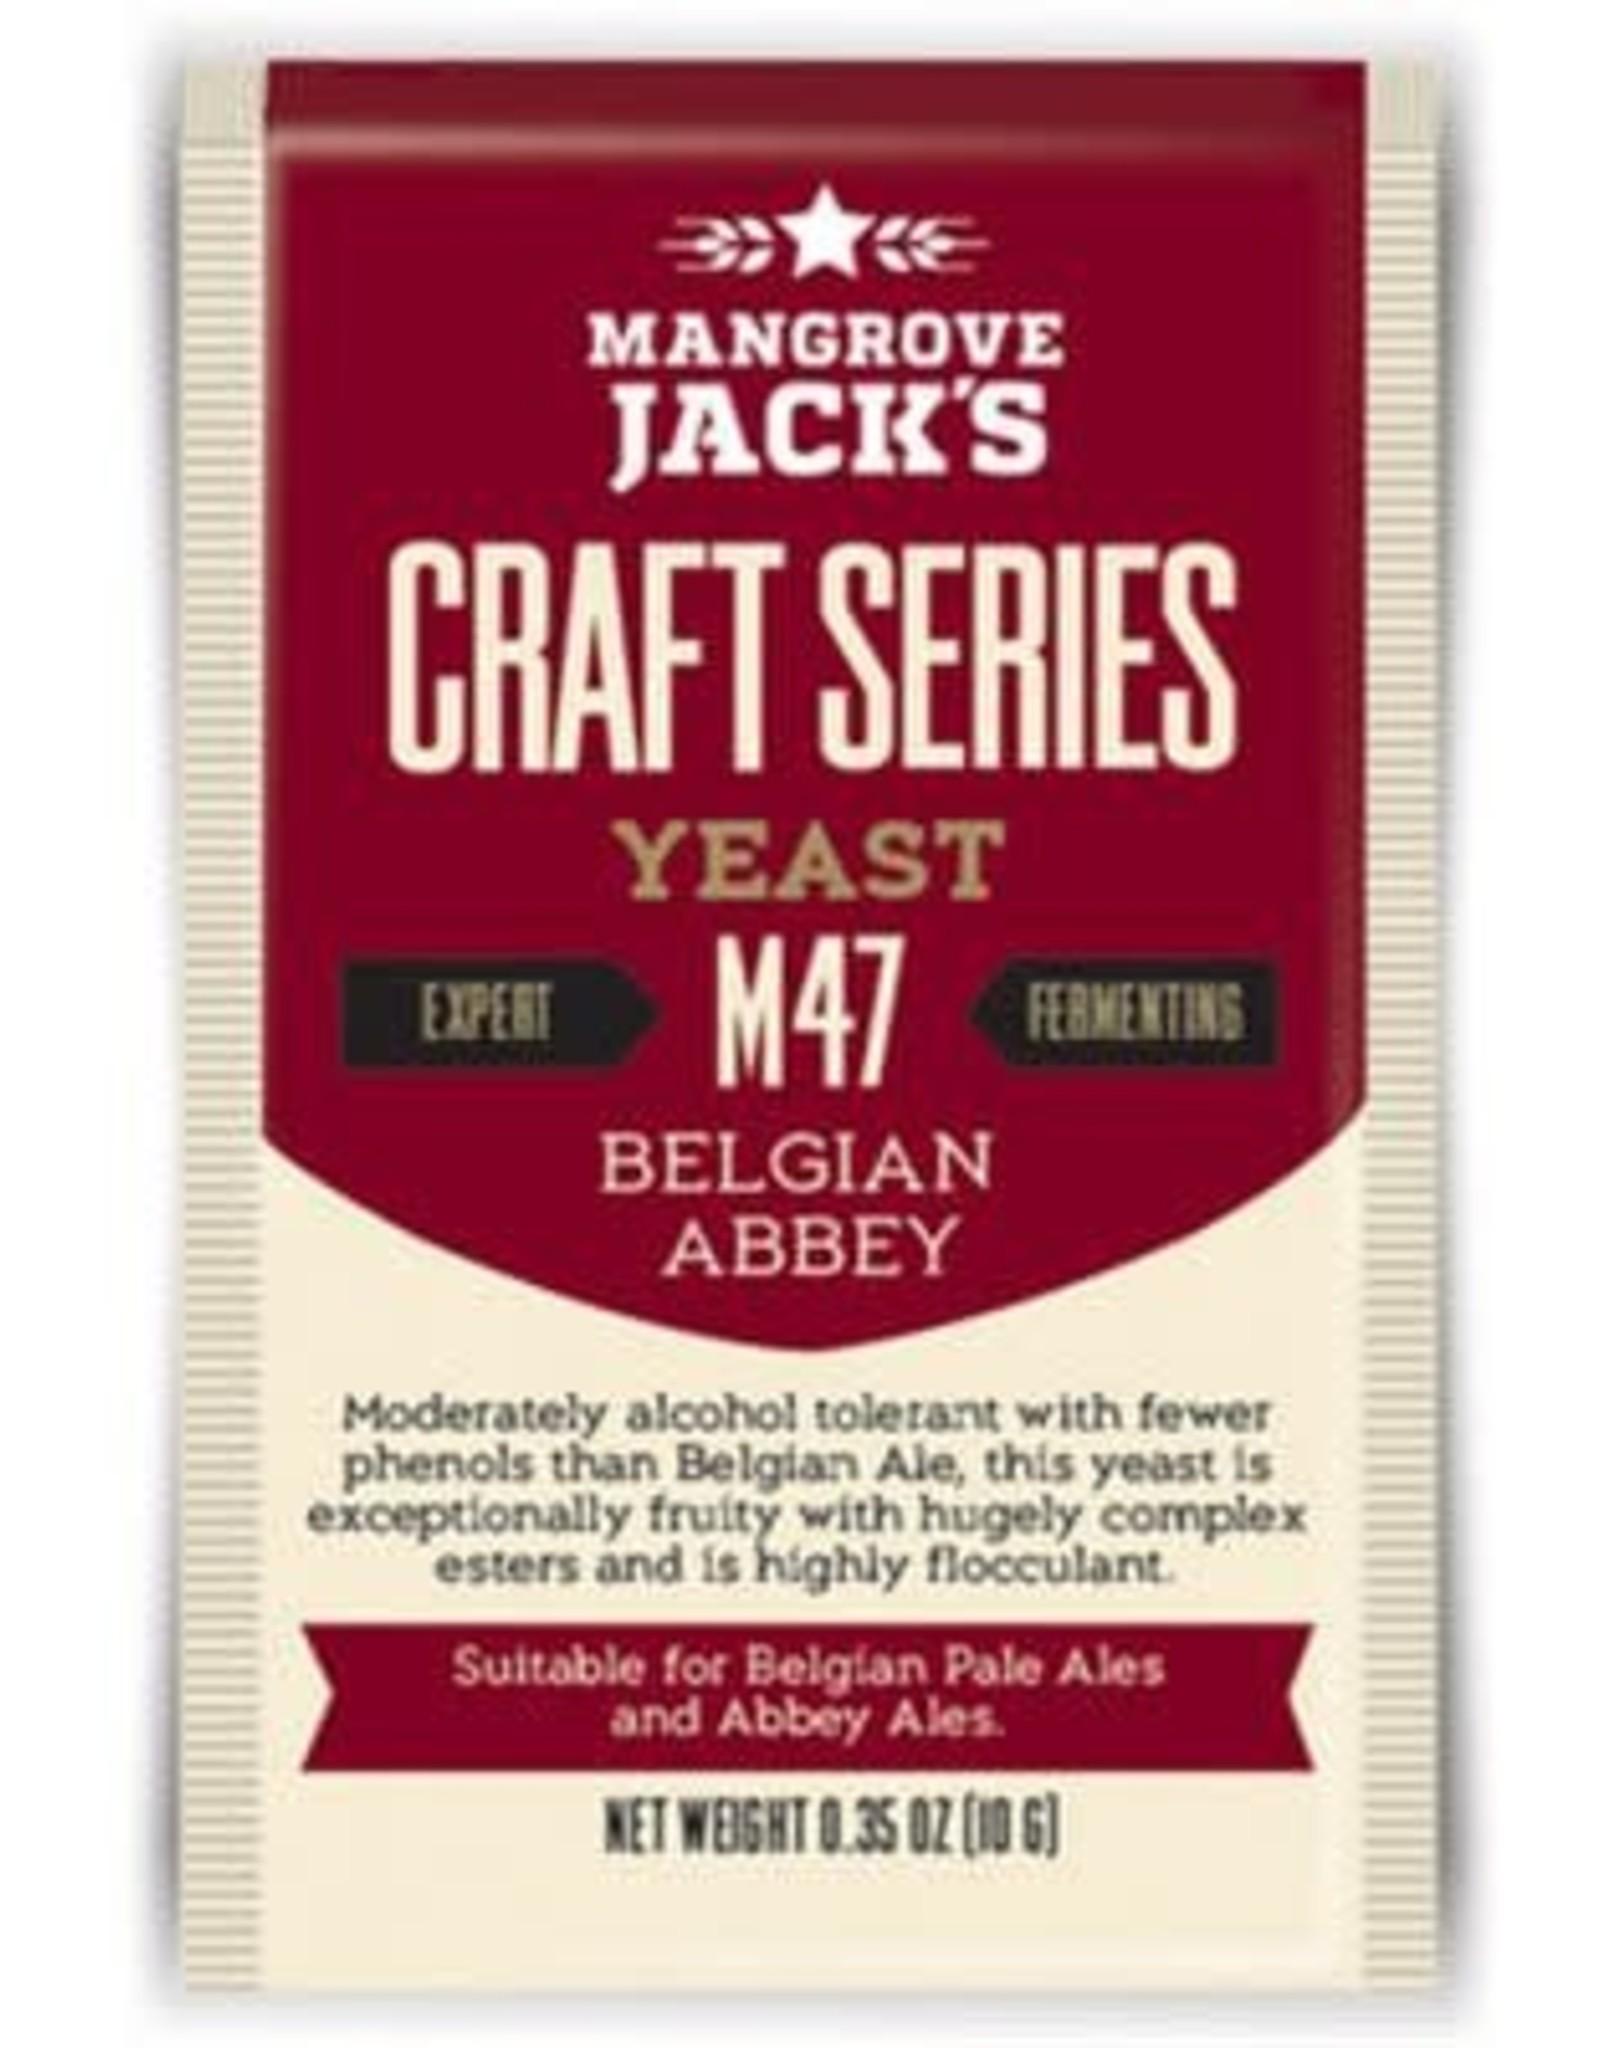 MANGROVE JACK'S BELGIAN ABBY M47